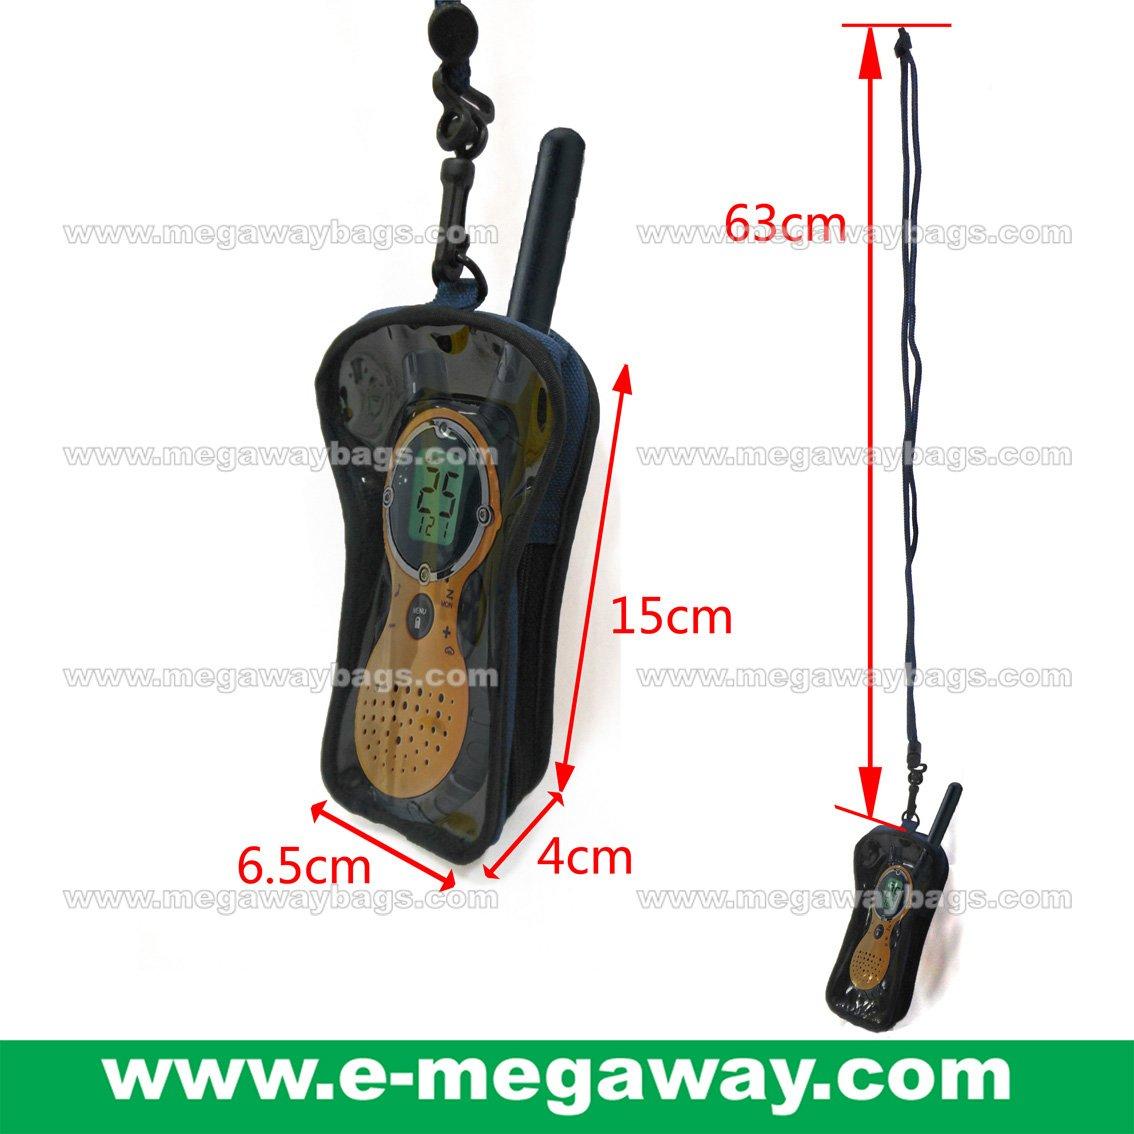 Walkie Talkie Electronics Neck Wallets Waterproof Tools Bags Pouch MegawayBags #CC-1054